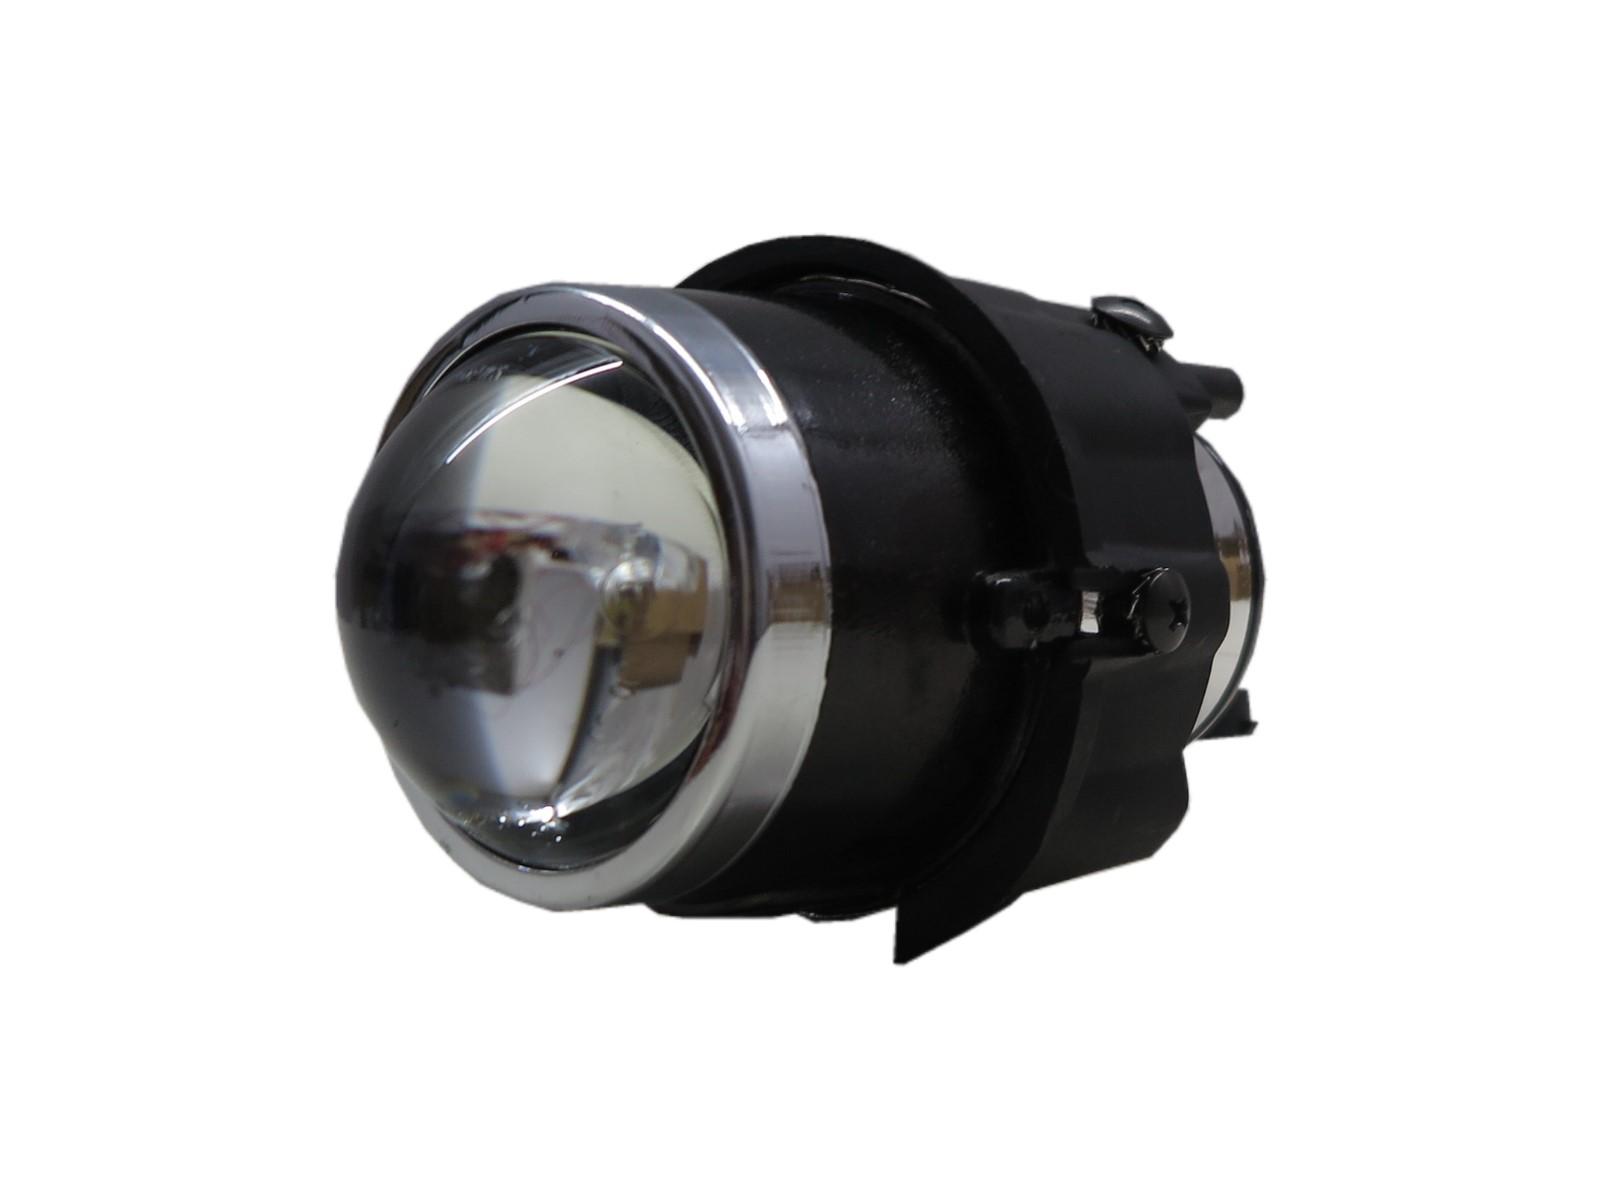 thumbnail 2 - MURANO Z51 Second generation 08-14 SUV 5D Projector Fog Light Black for NISSAN